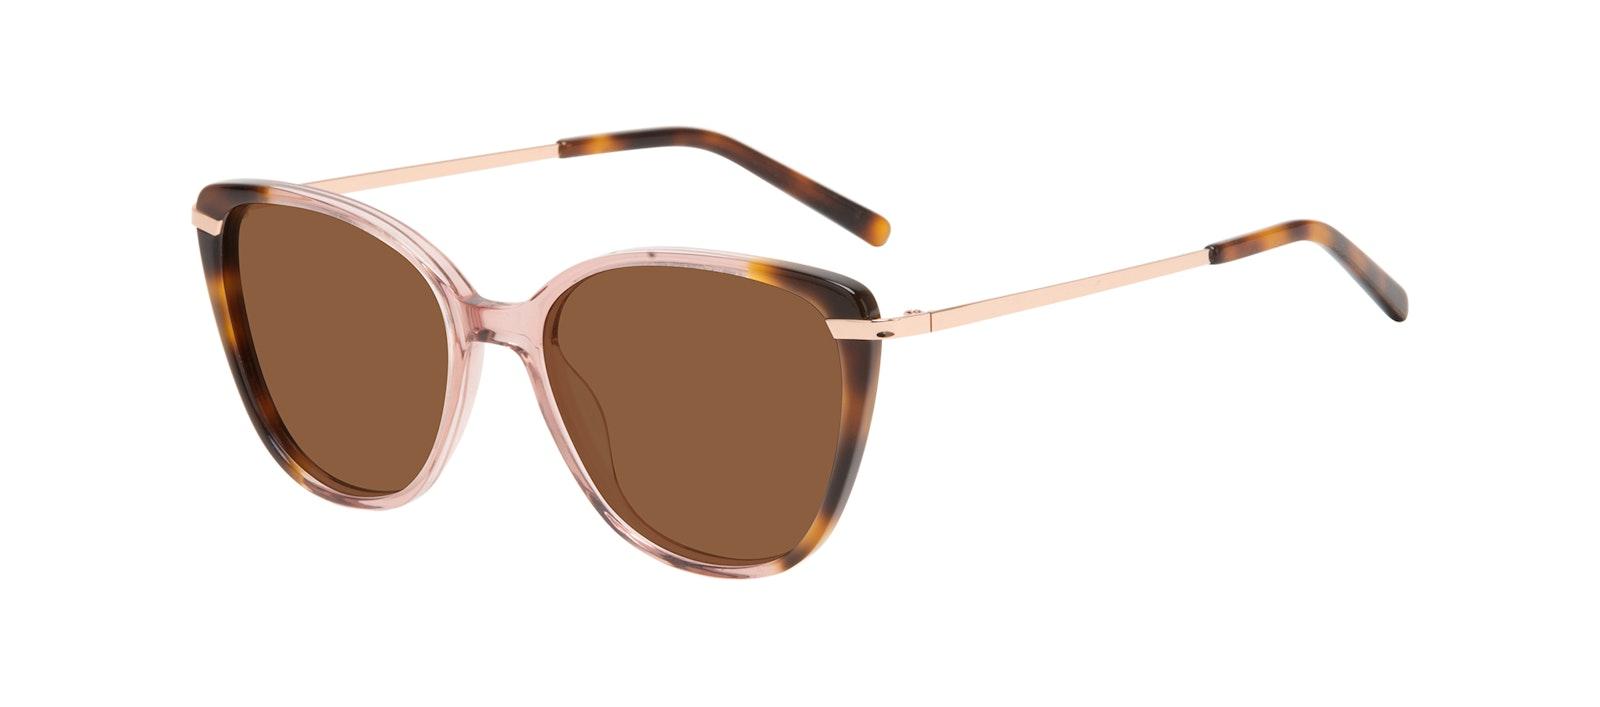 Affordable Fashion Glasses Rectangle Square Sunglasses Women Illusion Rose Tort Tilt